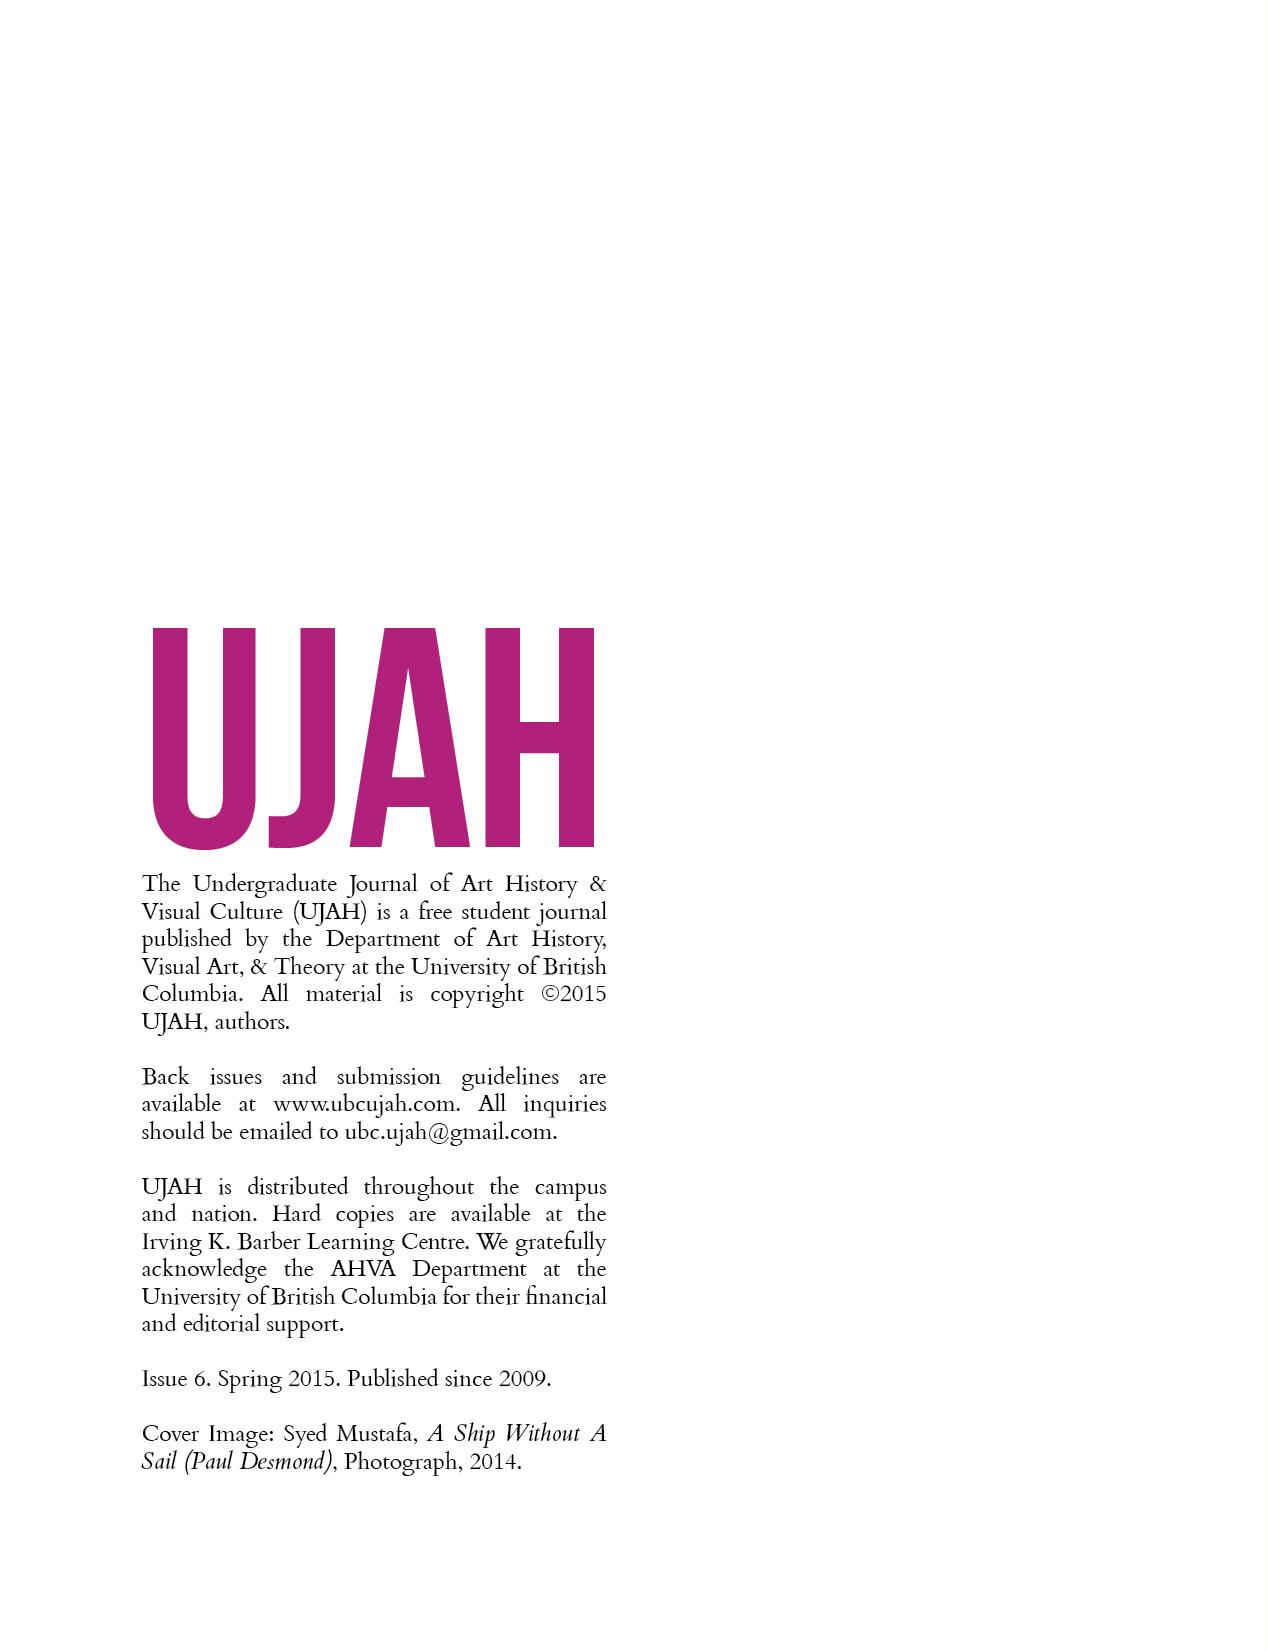 UJAH_Cover_JOL_Mar102insidecover.jpg